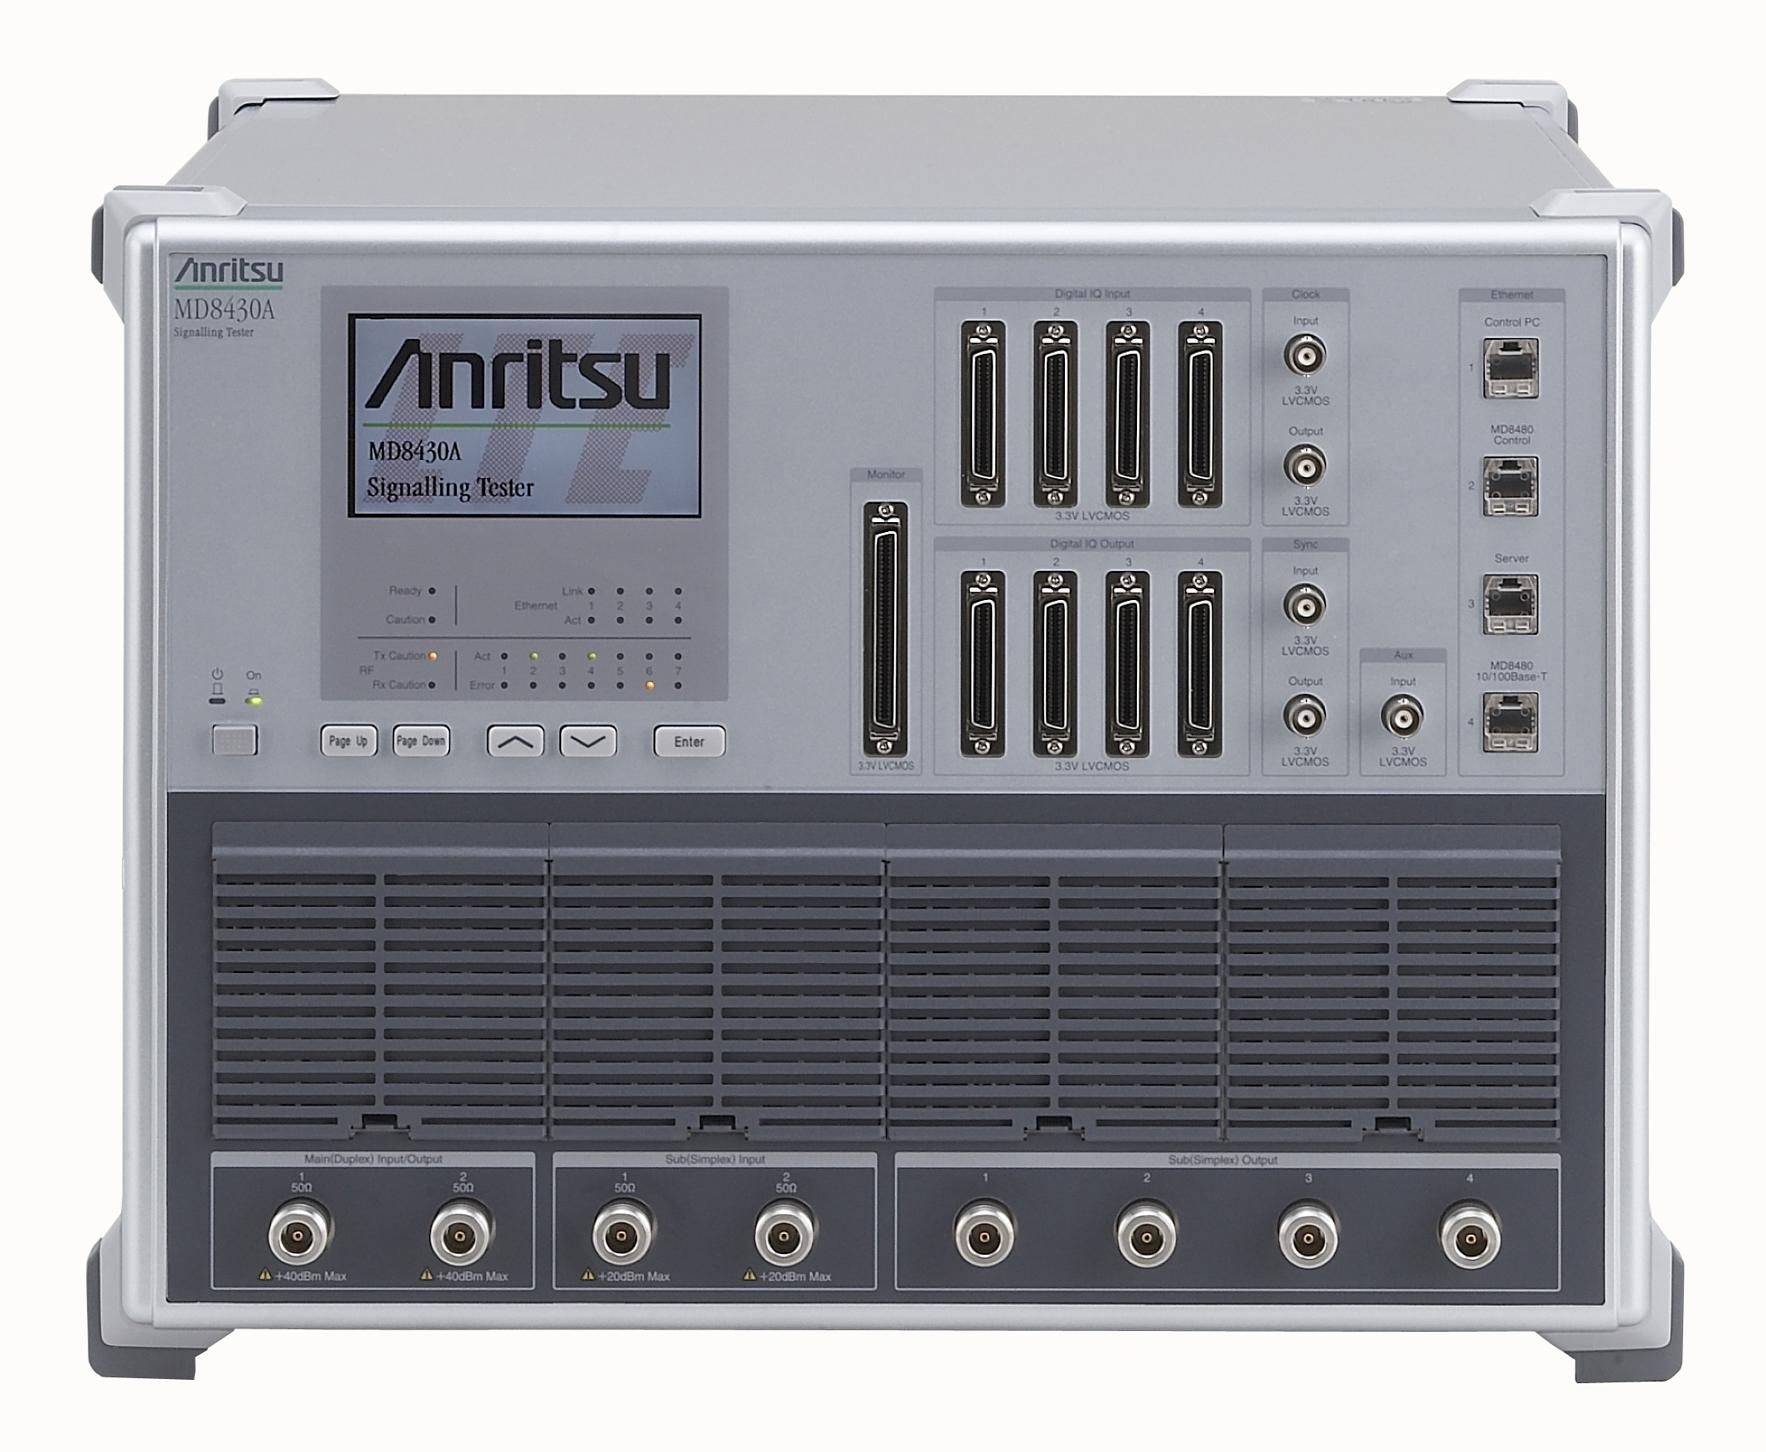 Anritsu_MD8430A.jpg